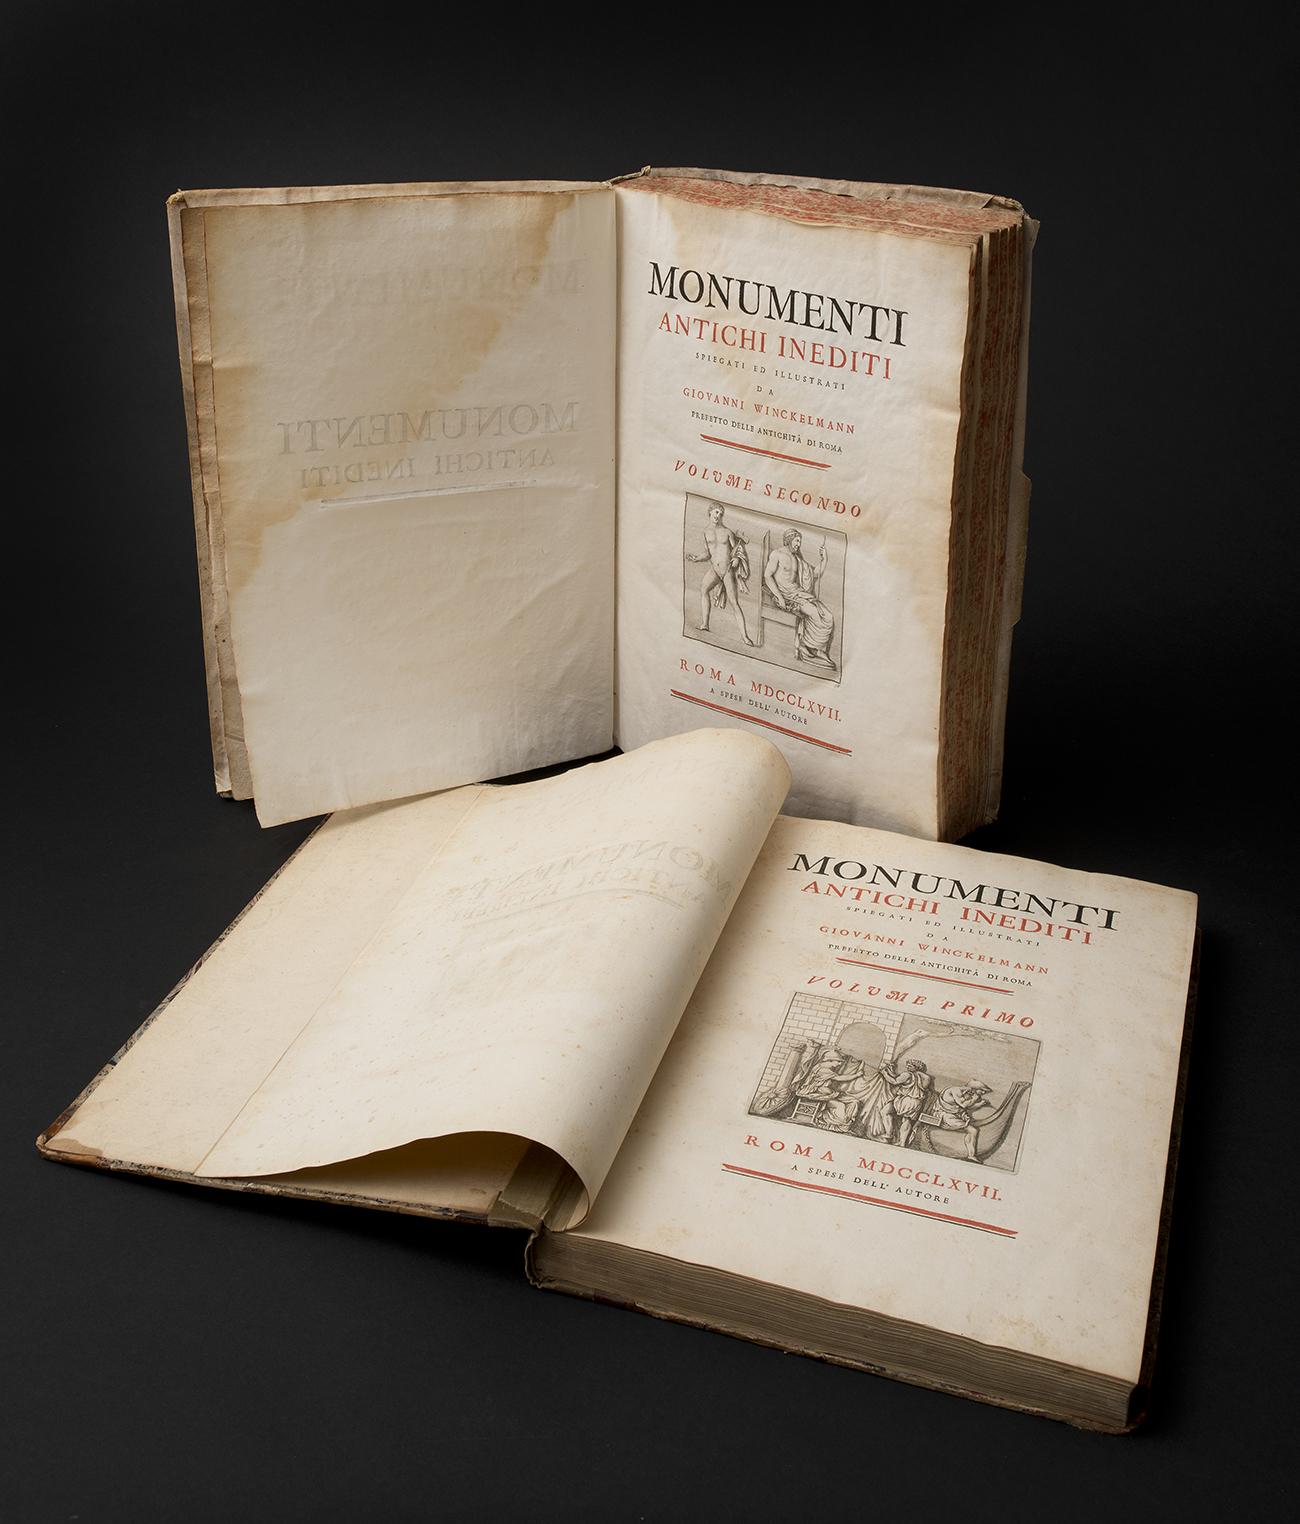 "Johann Joachim Winckelmann, Monumenti antichi inediti, editio princeps,  I und II Band, 1767, Nationale Bibliothek ""Vittorio Emanuele III"", Neapel"